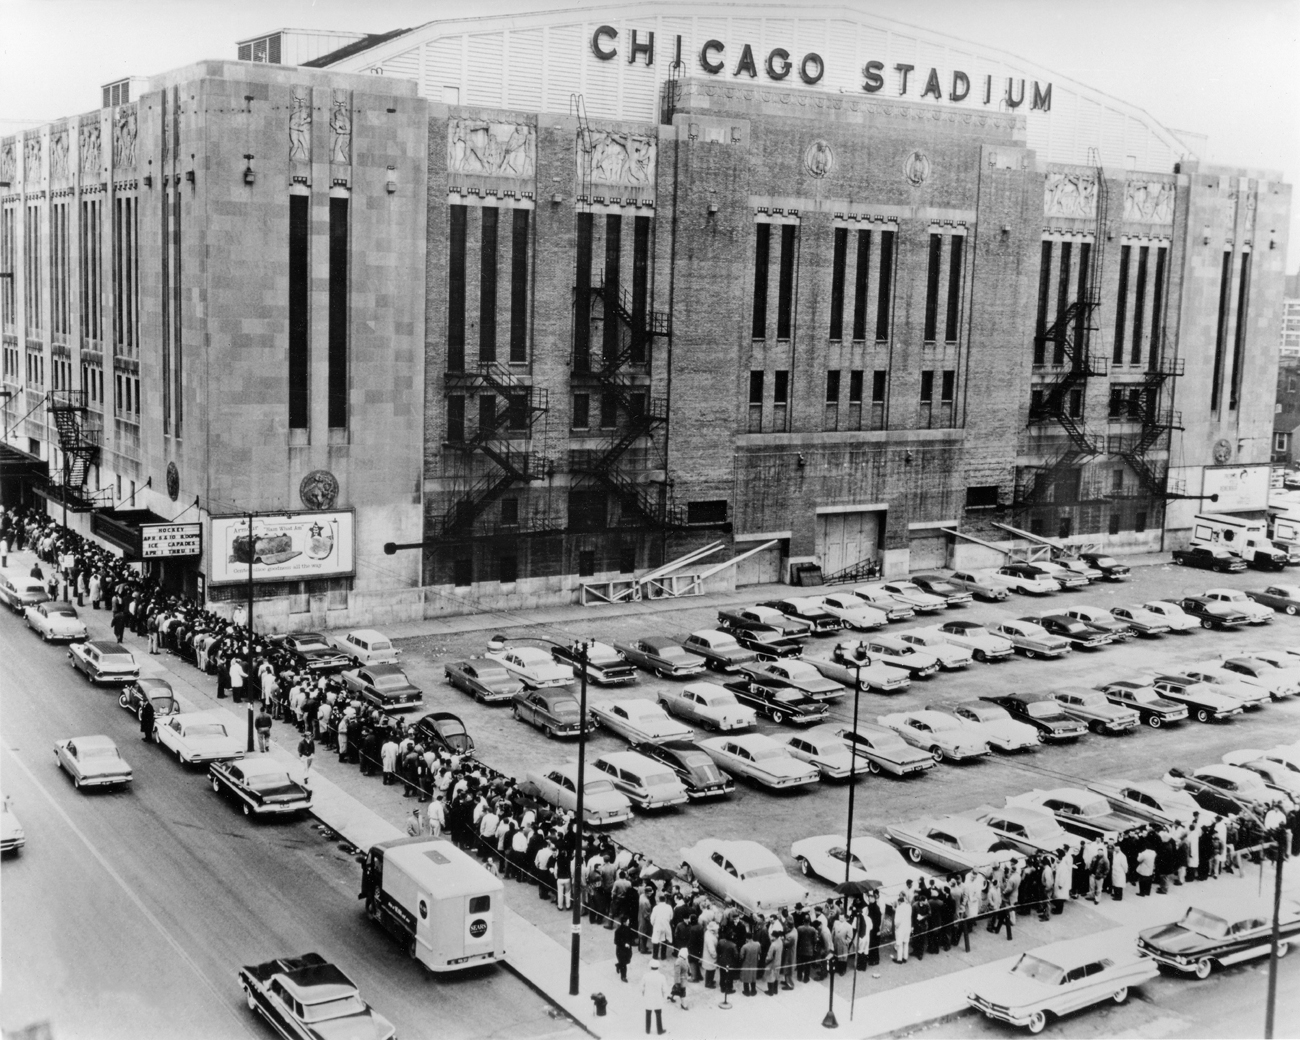 Vintage Chicago Stadium -